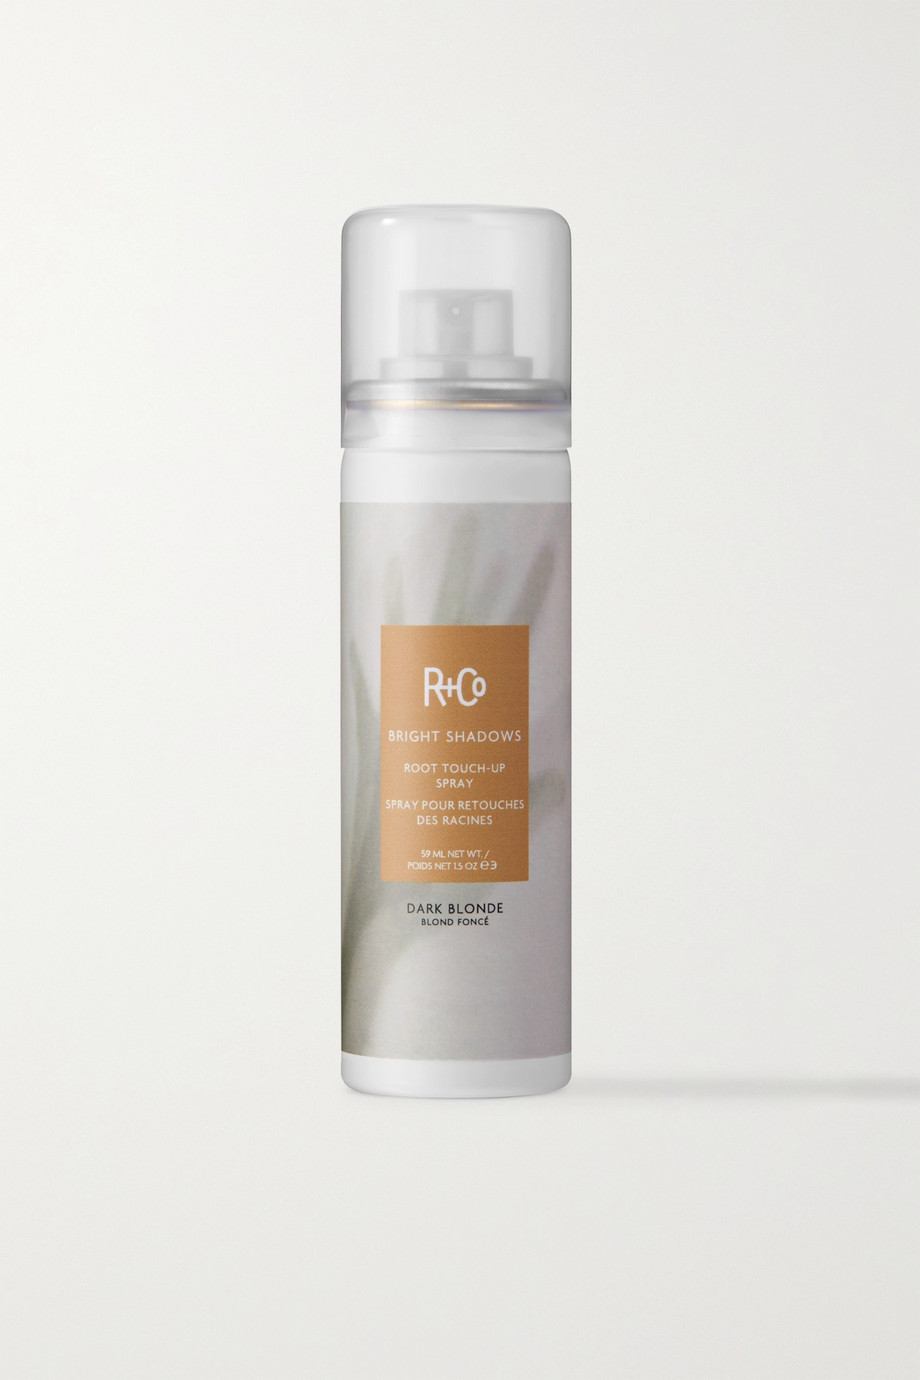 R+Co Bright Shadows Root Touch-Up Spray - Dark Blonde, 59ml